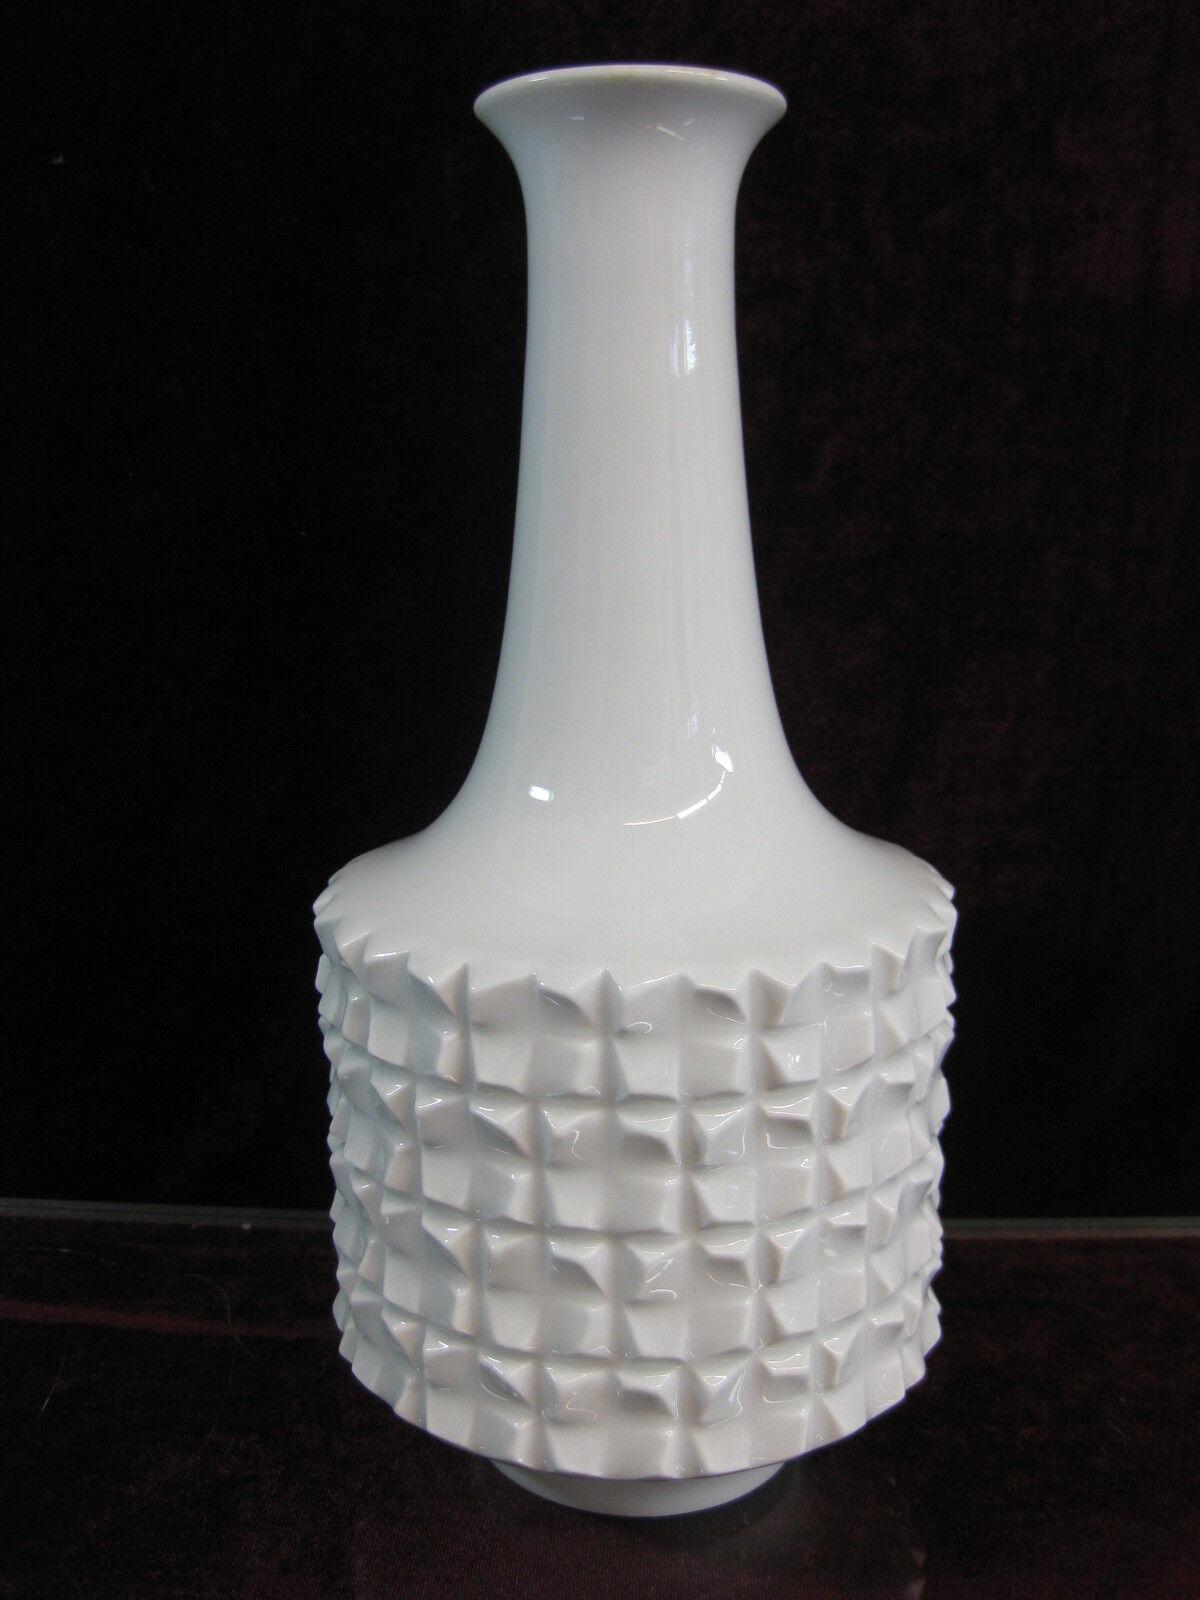 Meissen Blanc vase intacte top conservation 1 choix vintage 1970 Design